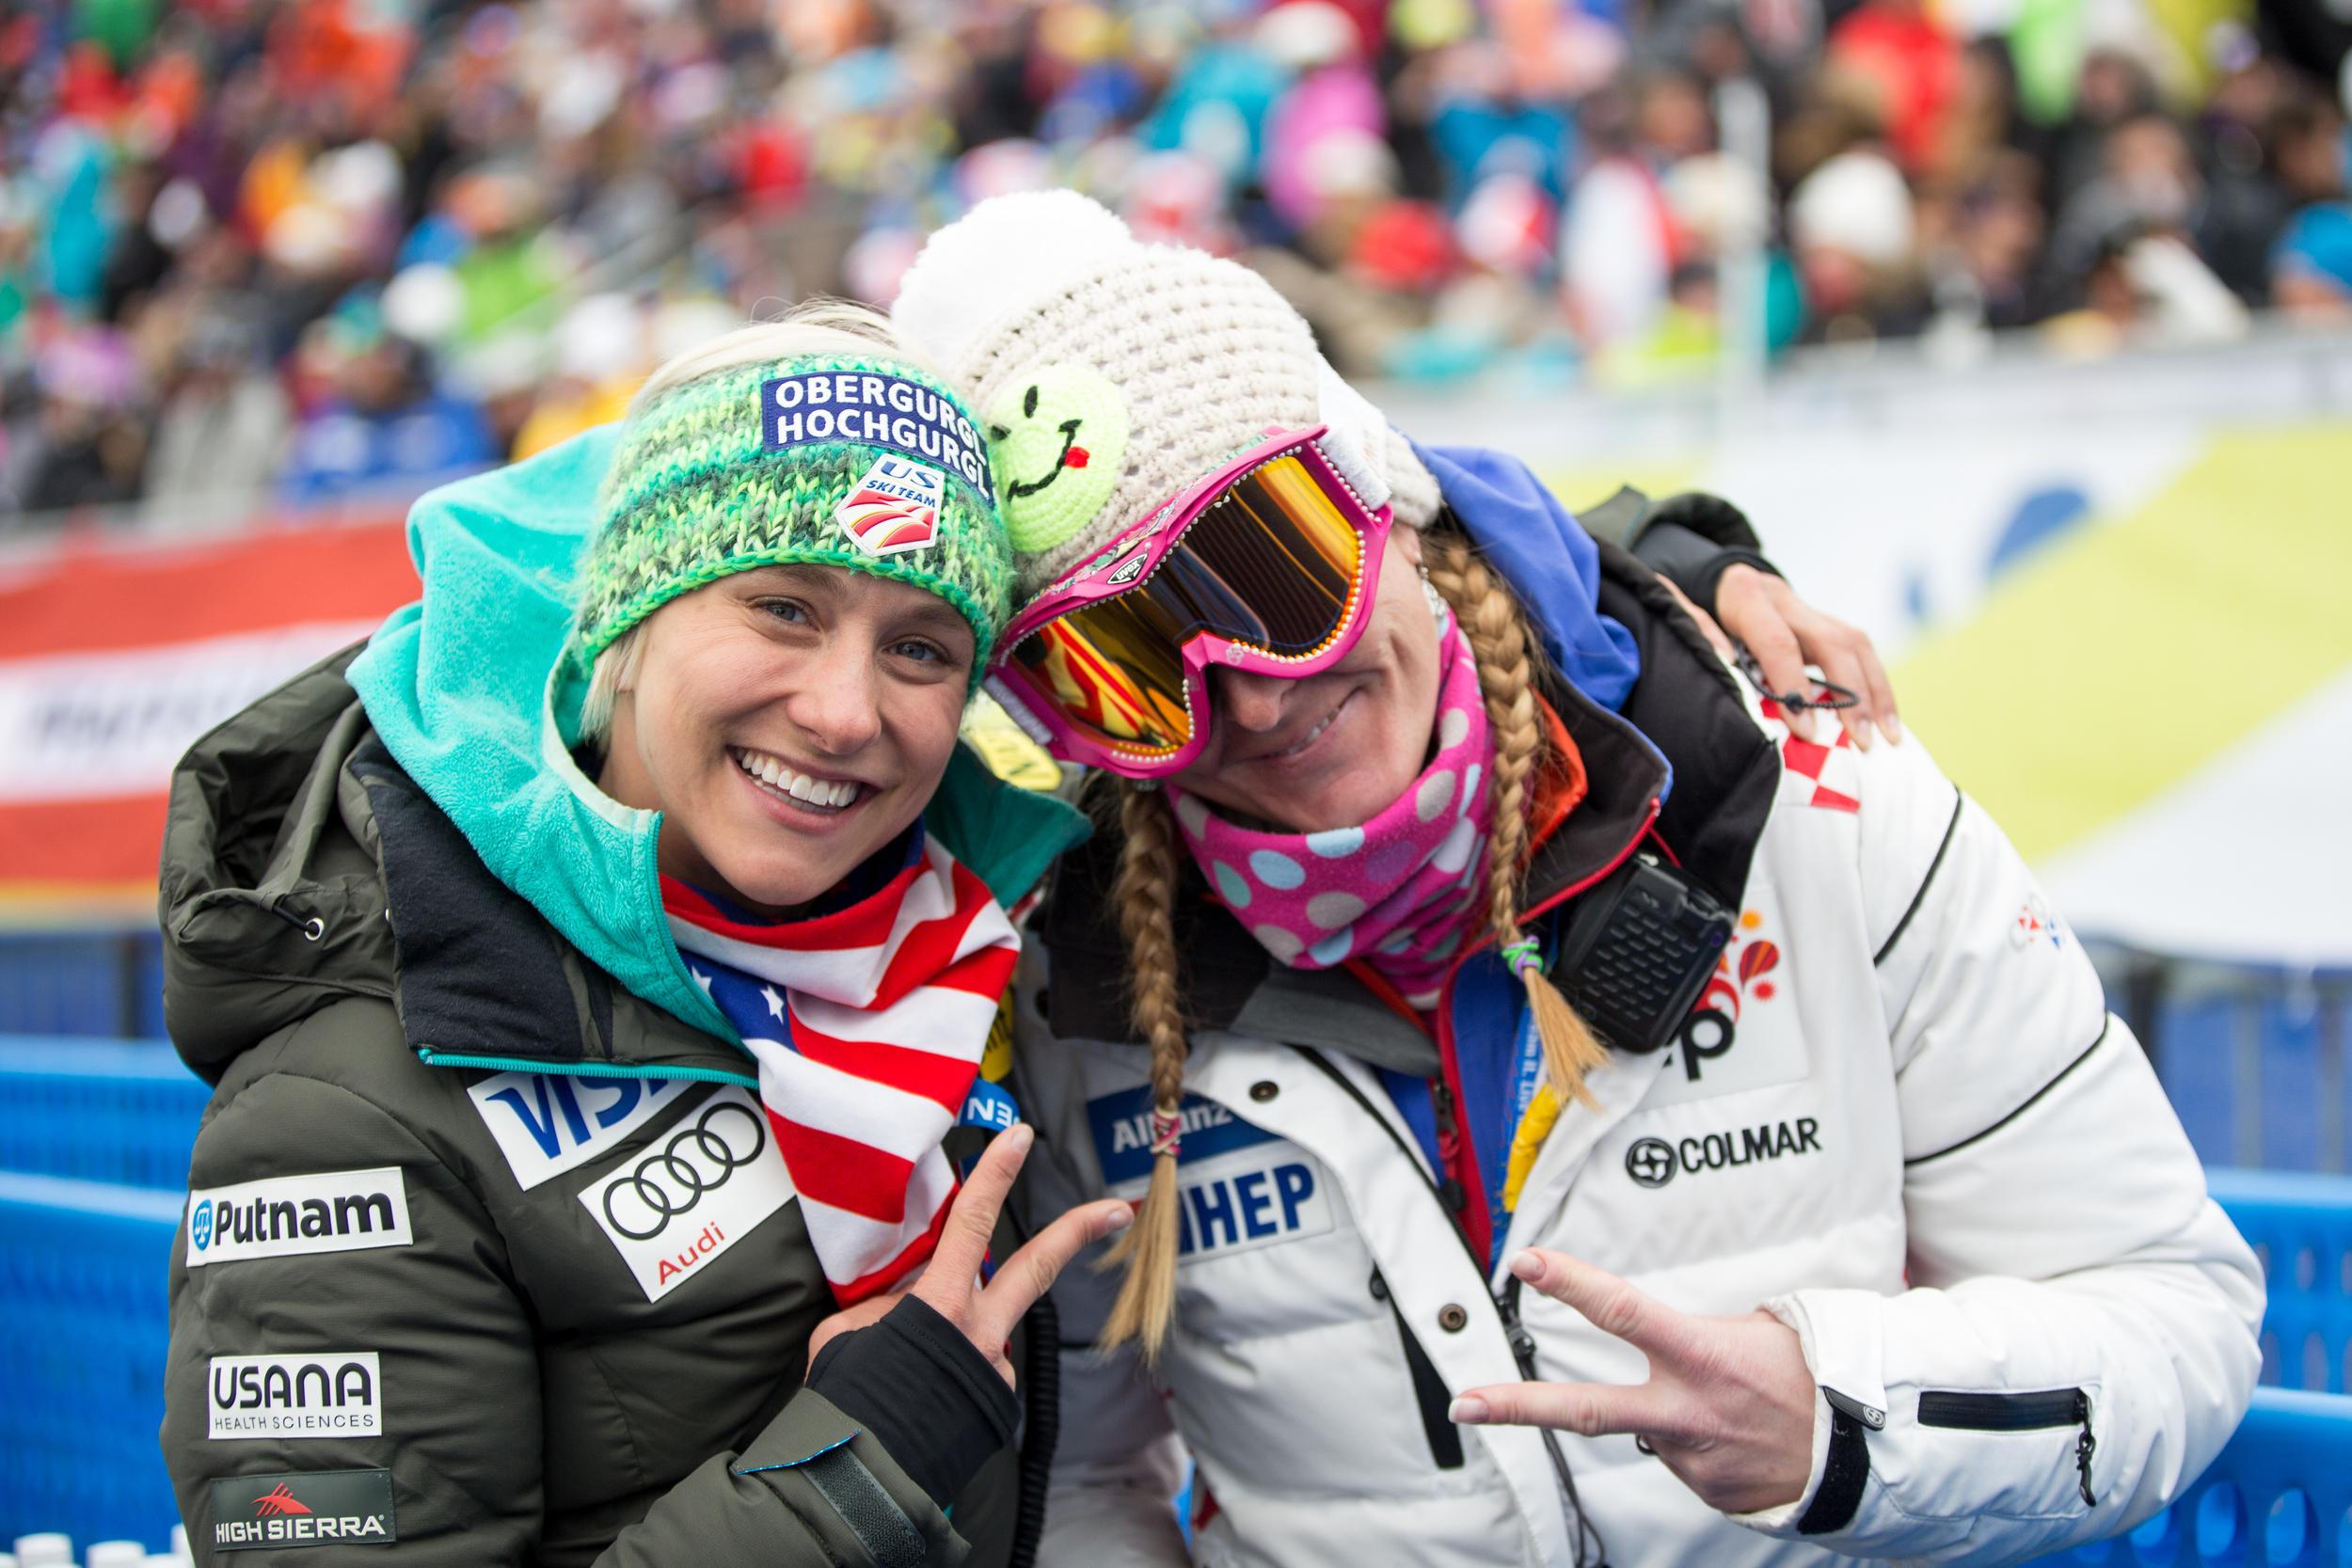 Megan and friend Janica Kostelic at the Men's Slalom 2015 FIS Alpine World Ski Championships at Vail/Beaver Creek. Photo: USSA